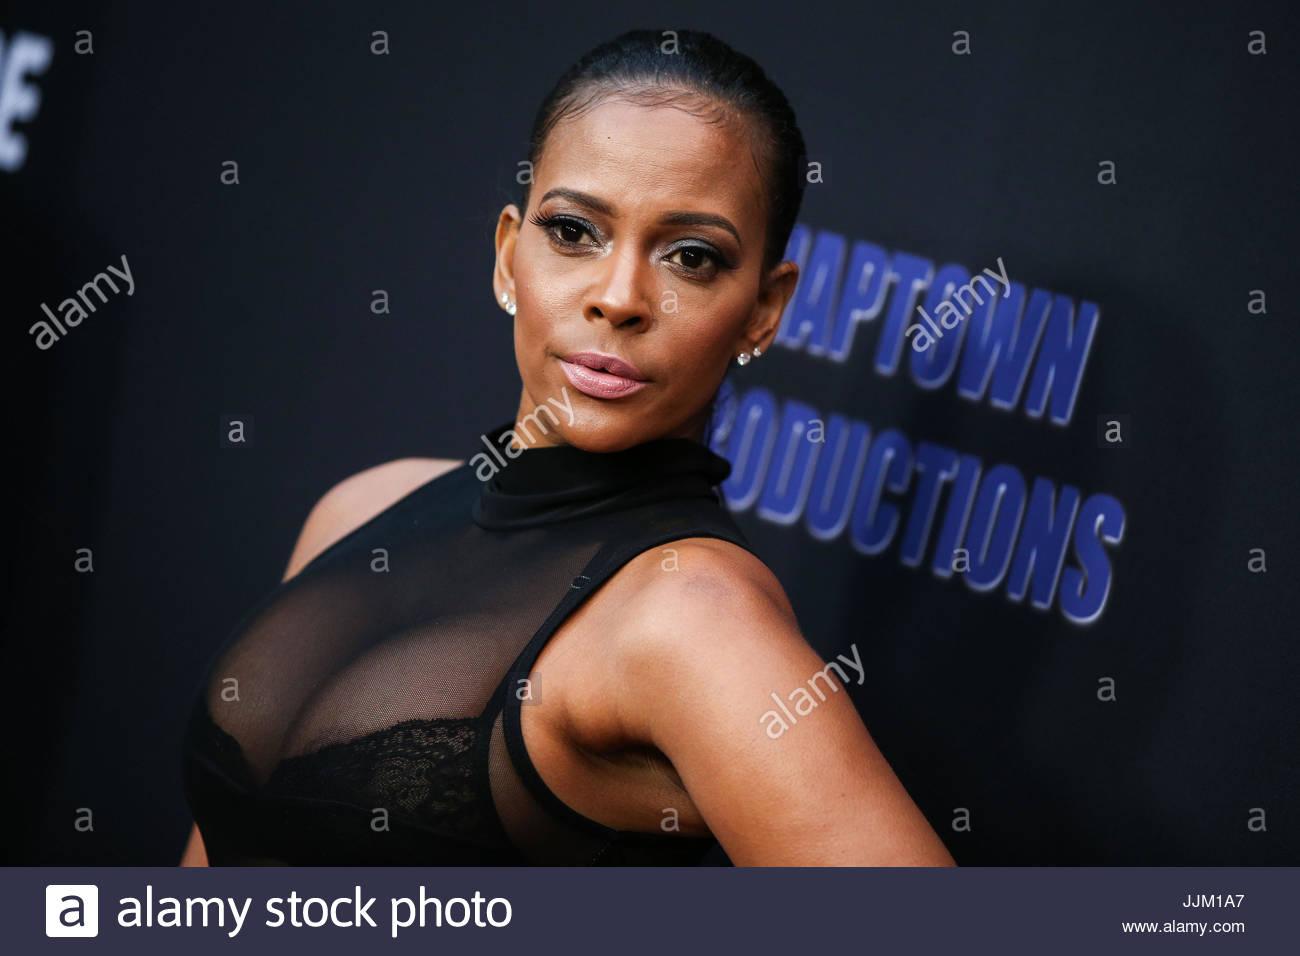 Celebrity Sundy Carter nude (87 photo), Ass, Sideboobs, Feet, panties 2019